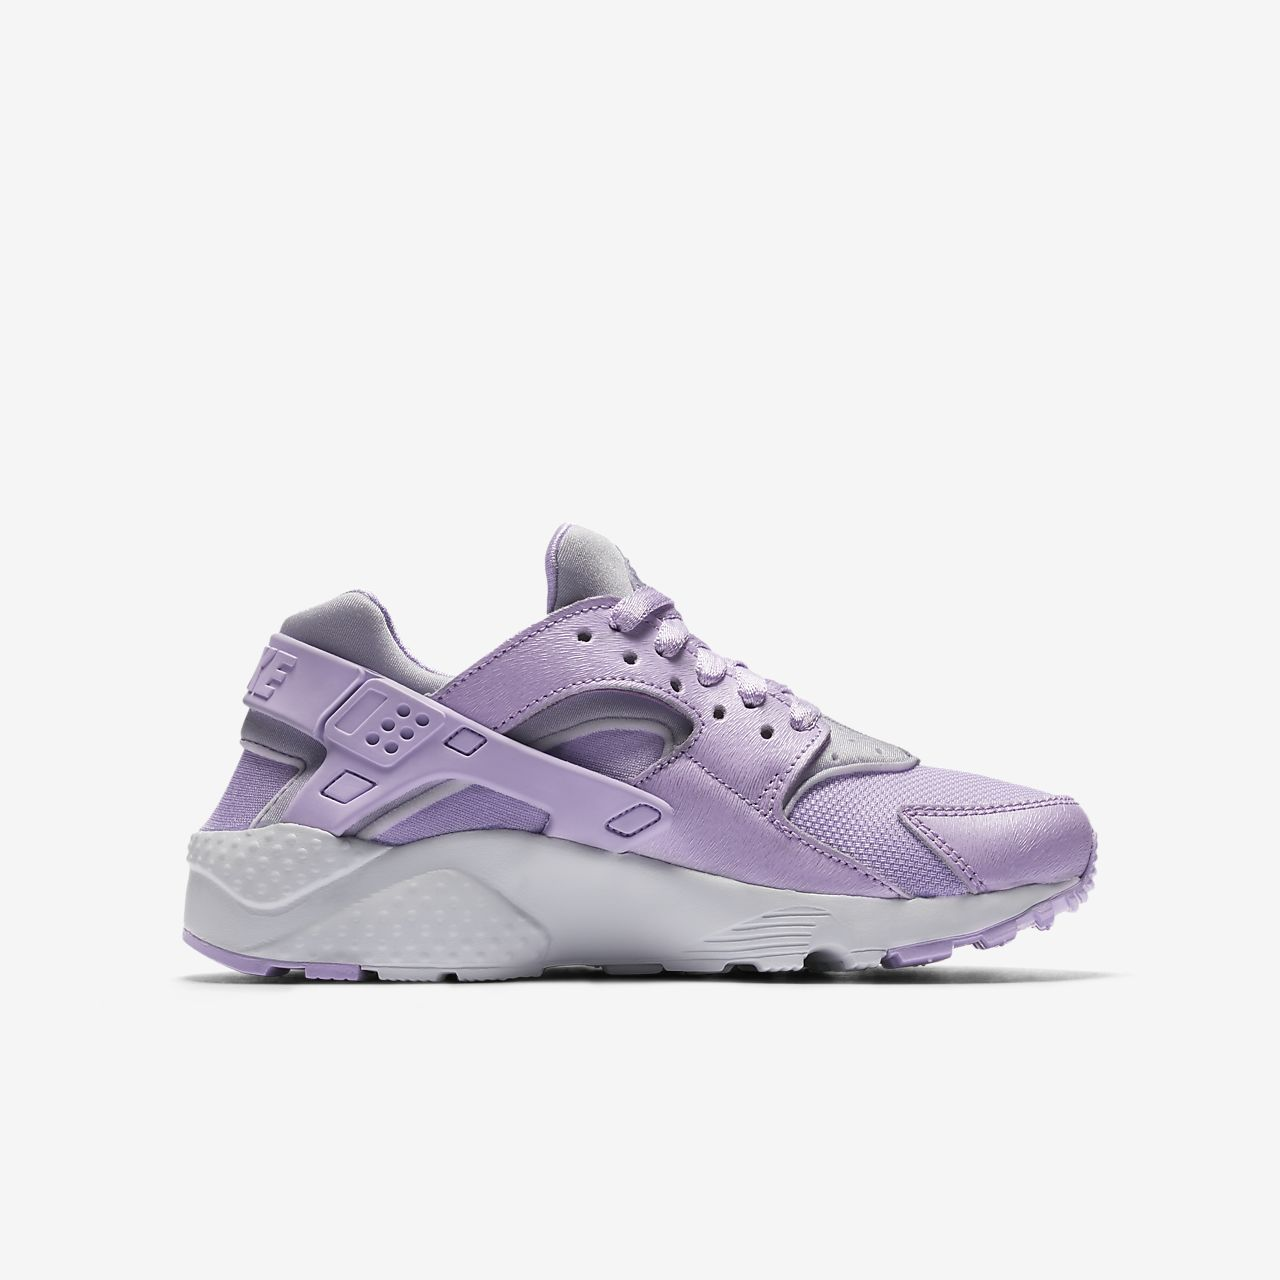 ... Nike Huarache SE Older Kids' Shoe